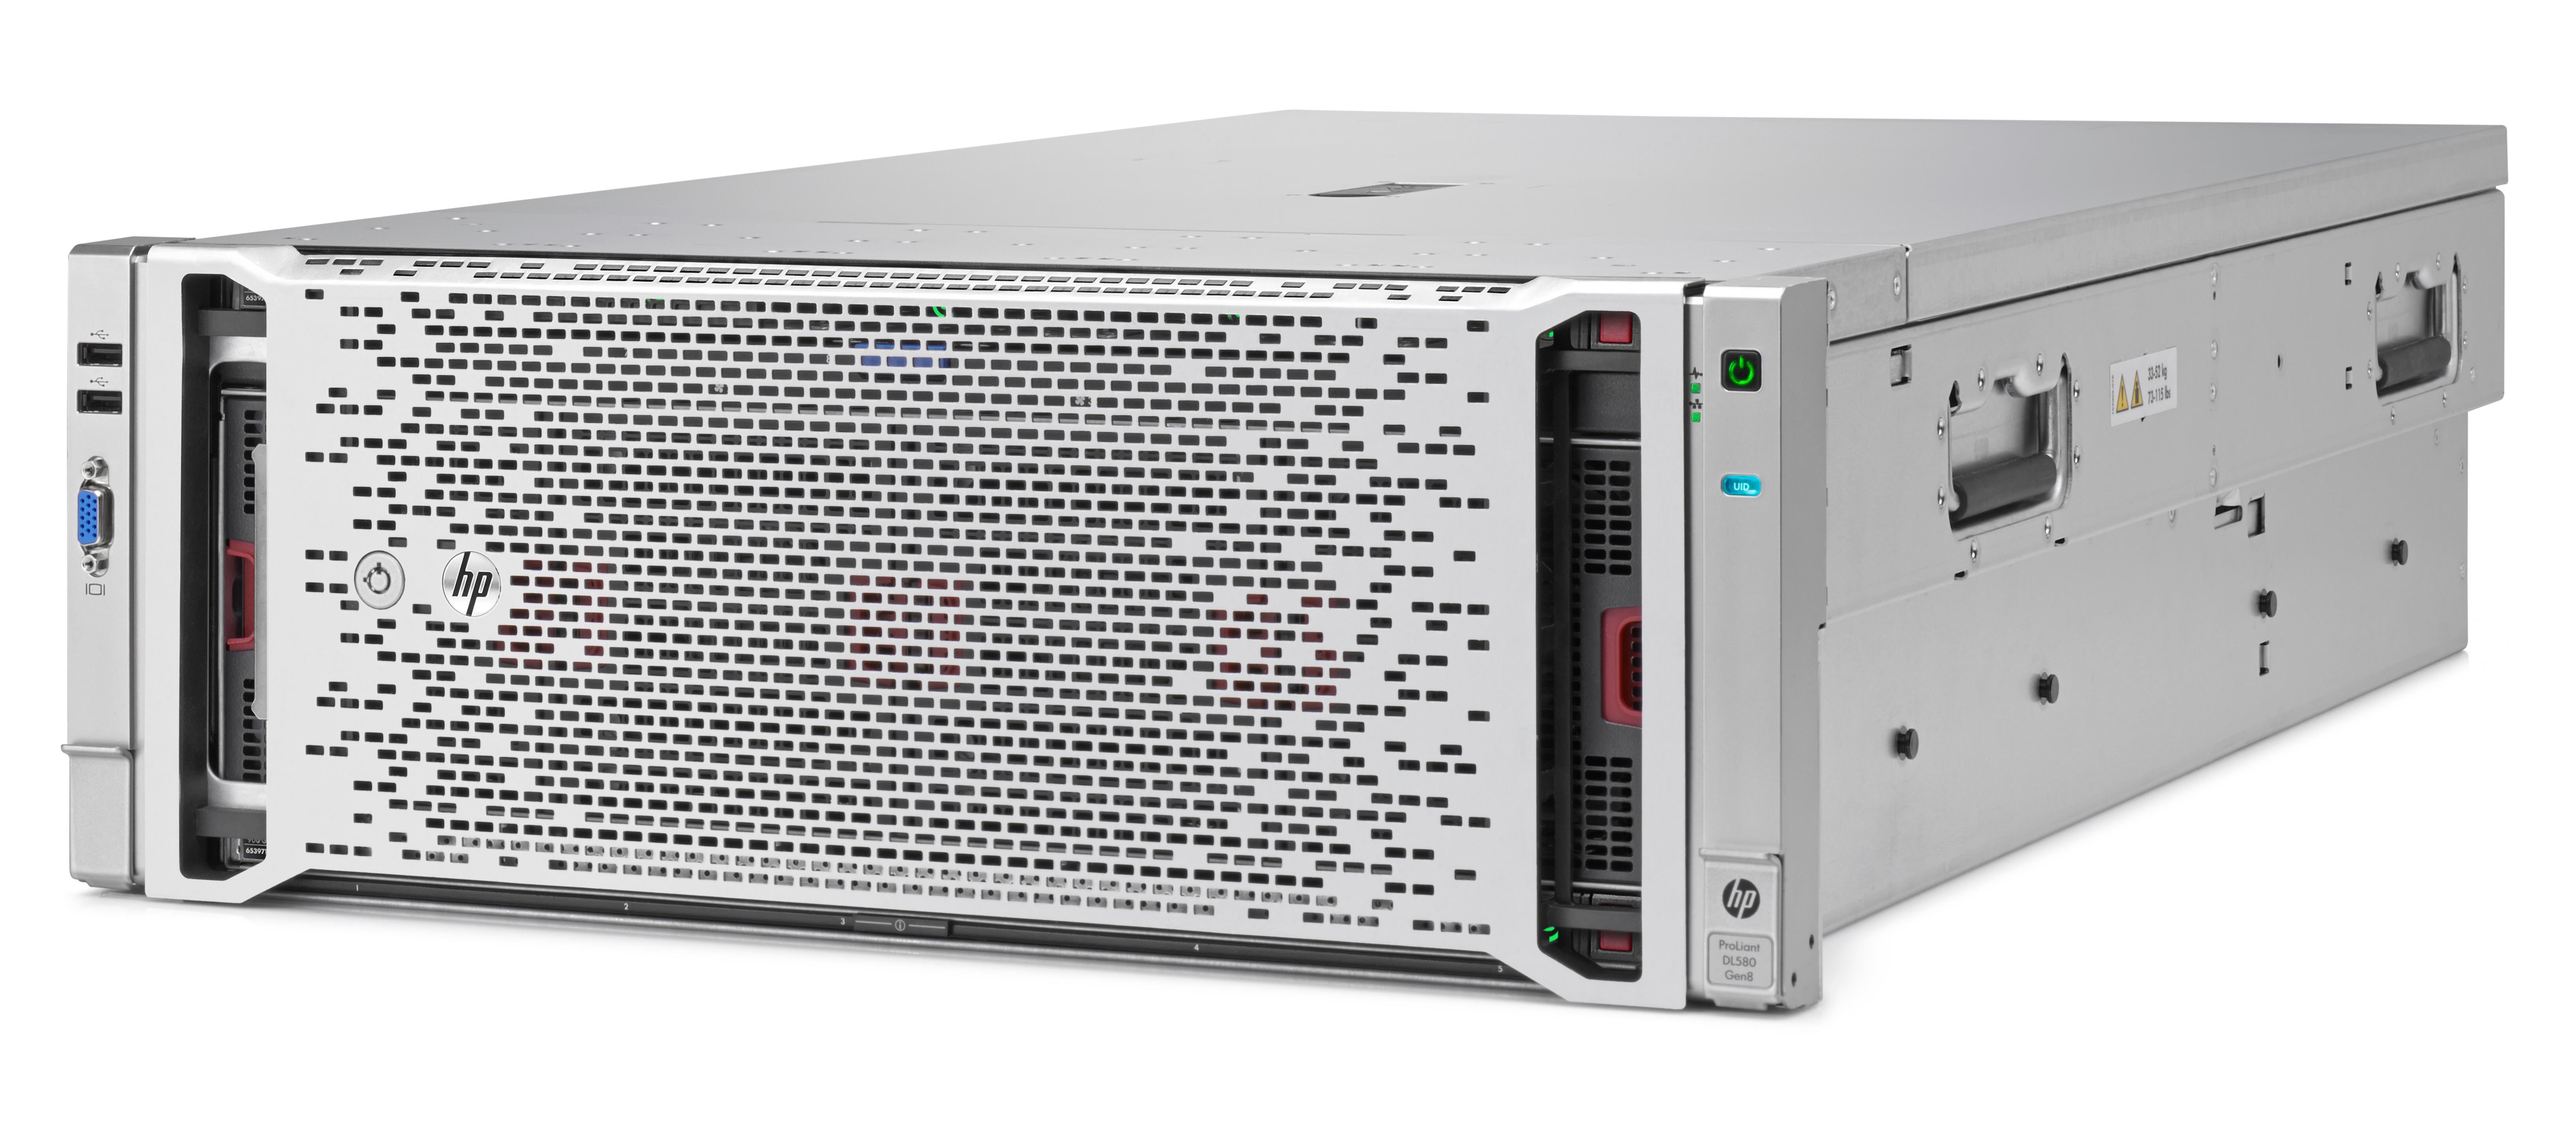 HP ProLiant DL580 Gen8 (4U) Server (2P) Xeon Six Core E7 (4809 v2) 1.9GHz 64GB-R (No HDD) SAS/SATA/SSD SFF 331FLR P830i/2G with 2 x 1200W Power Supply